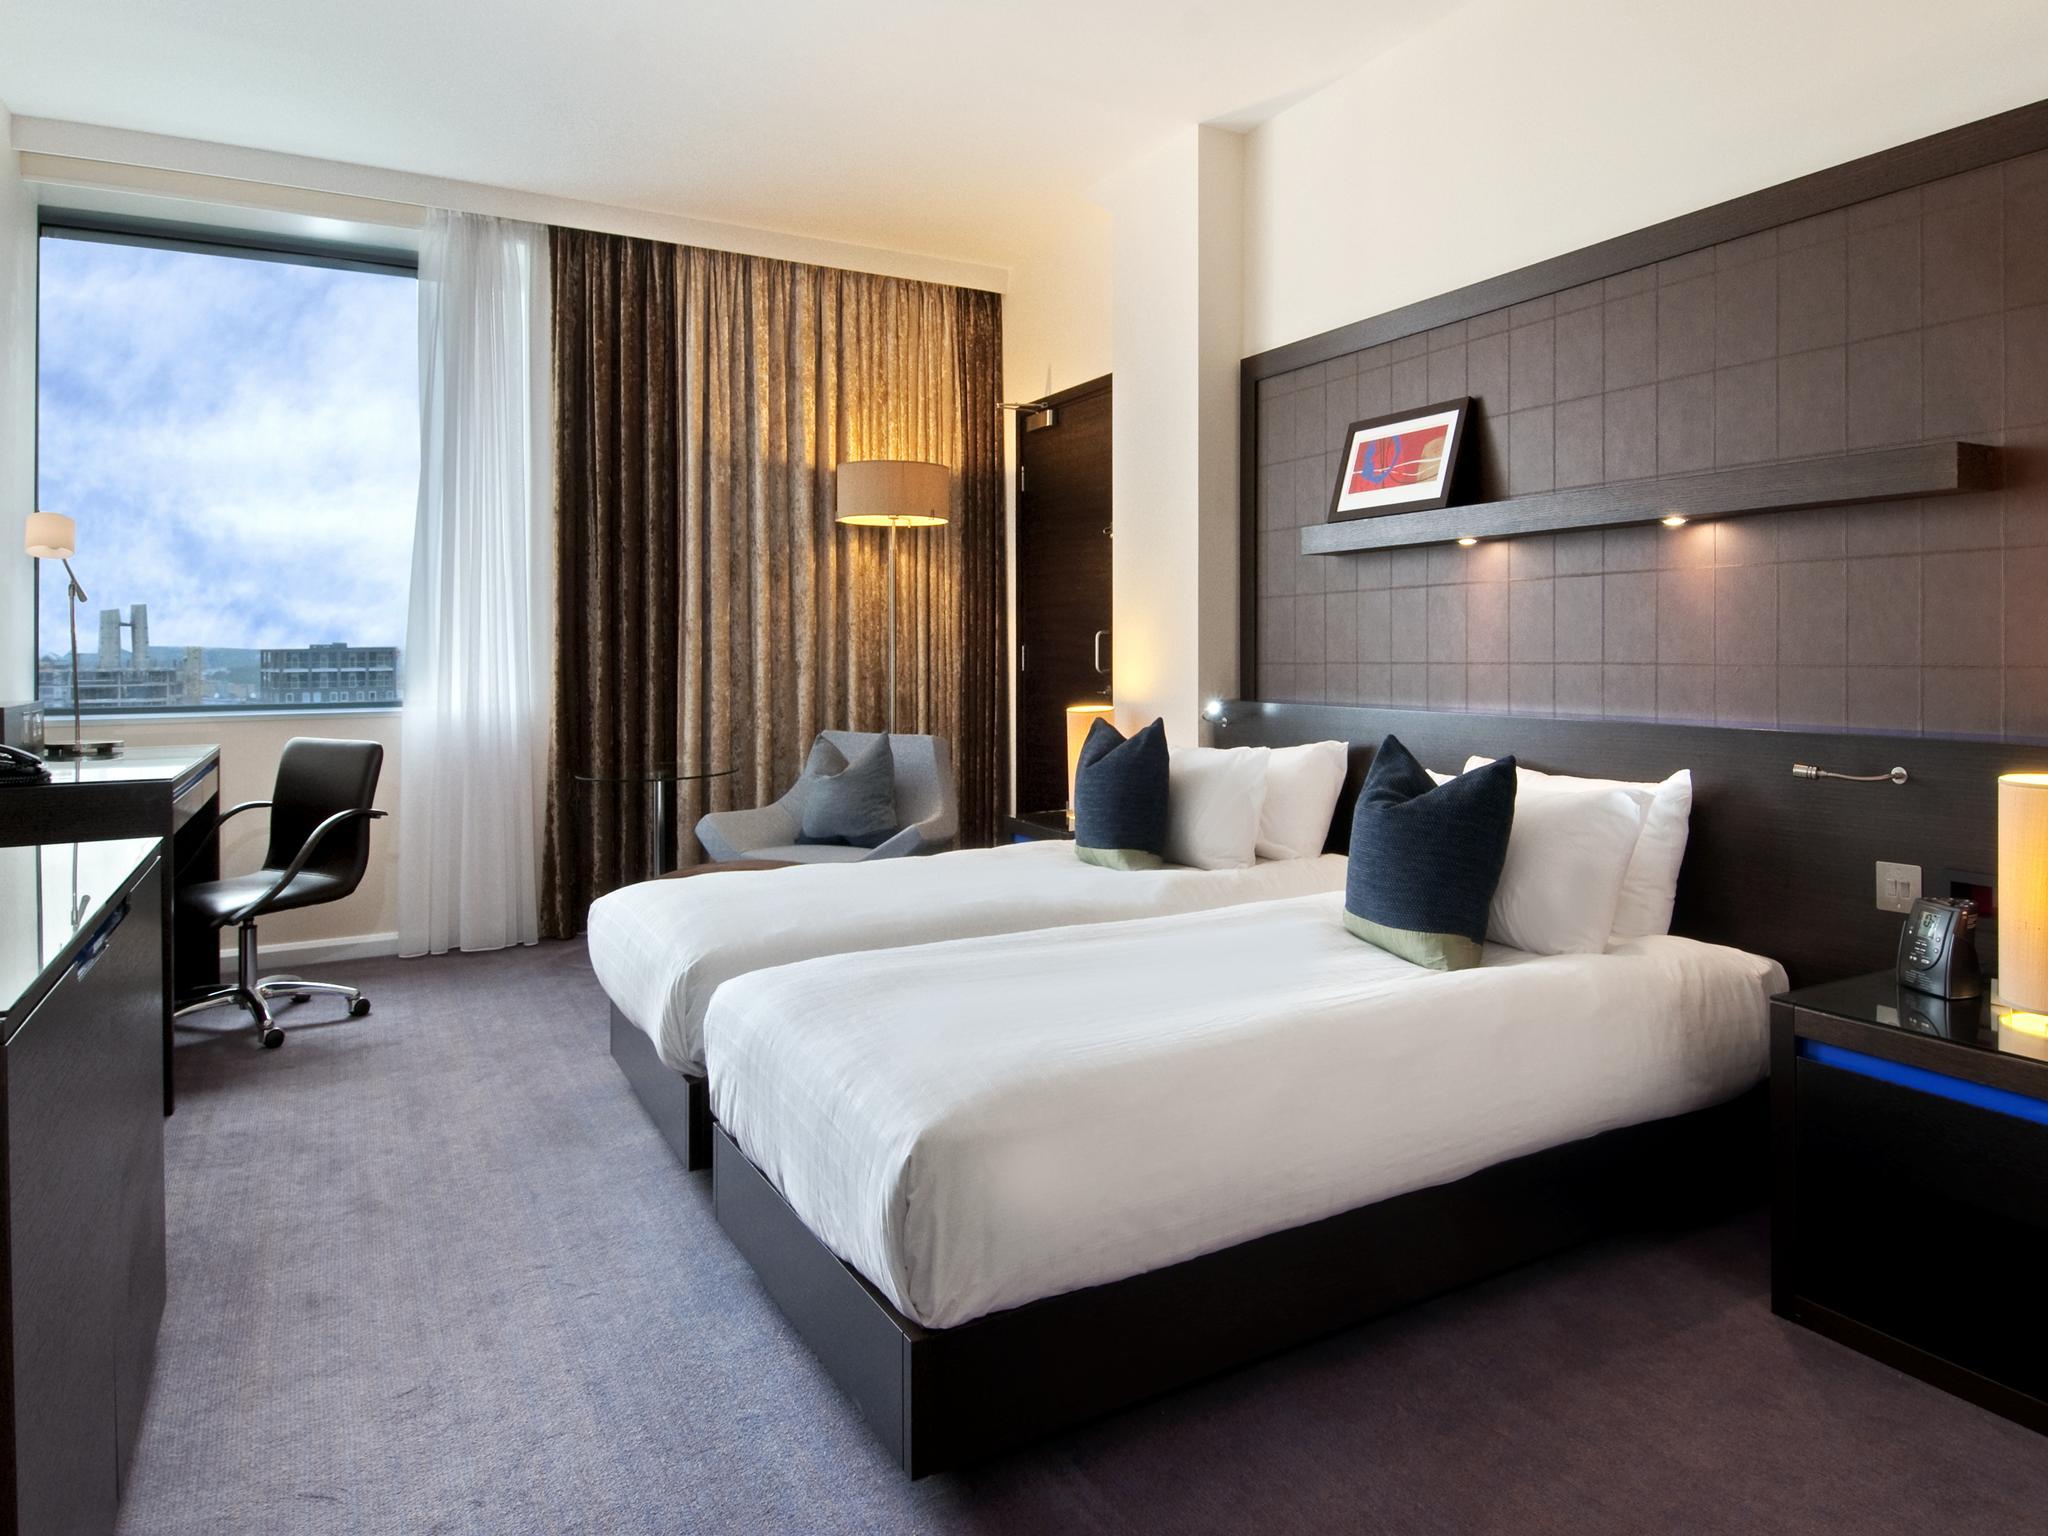 Hotel Londres Chambre  Personnes